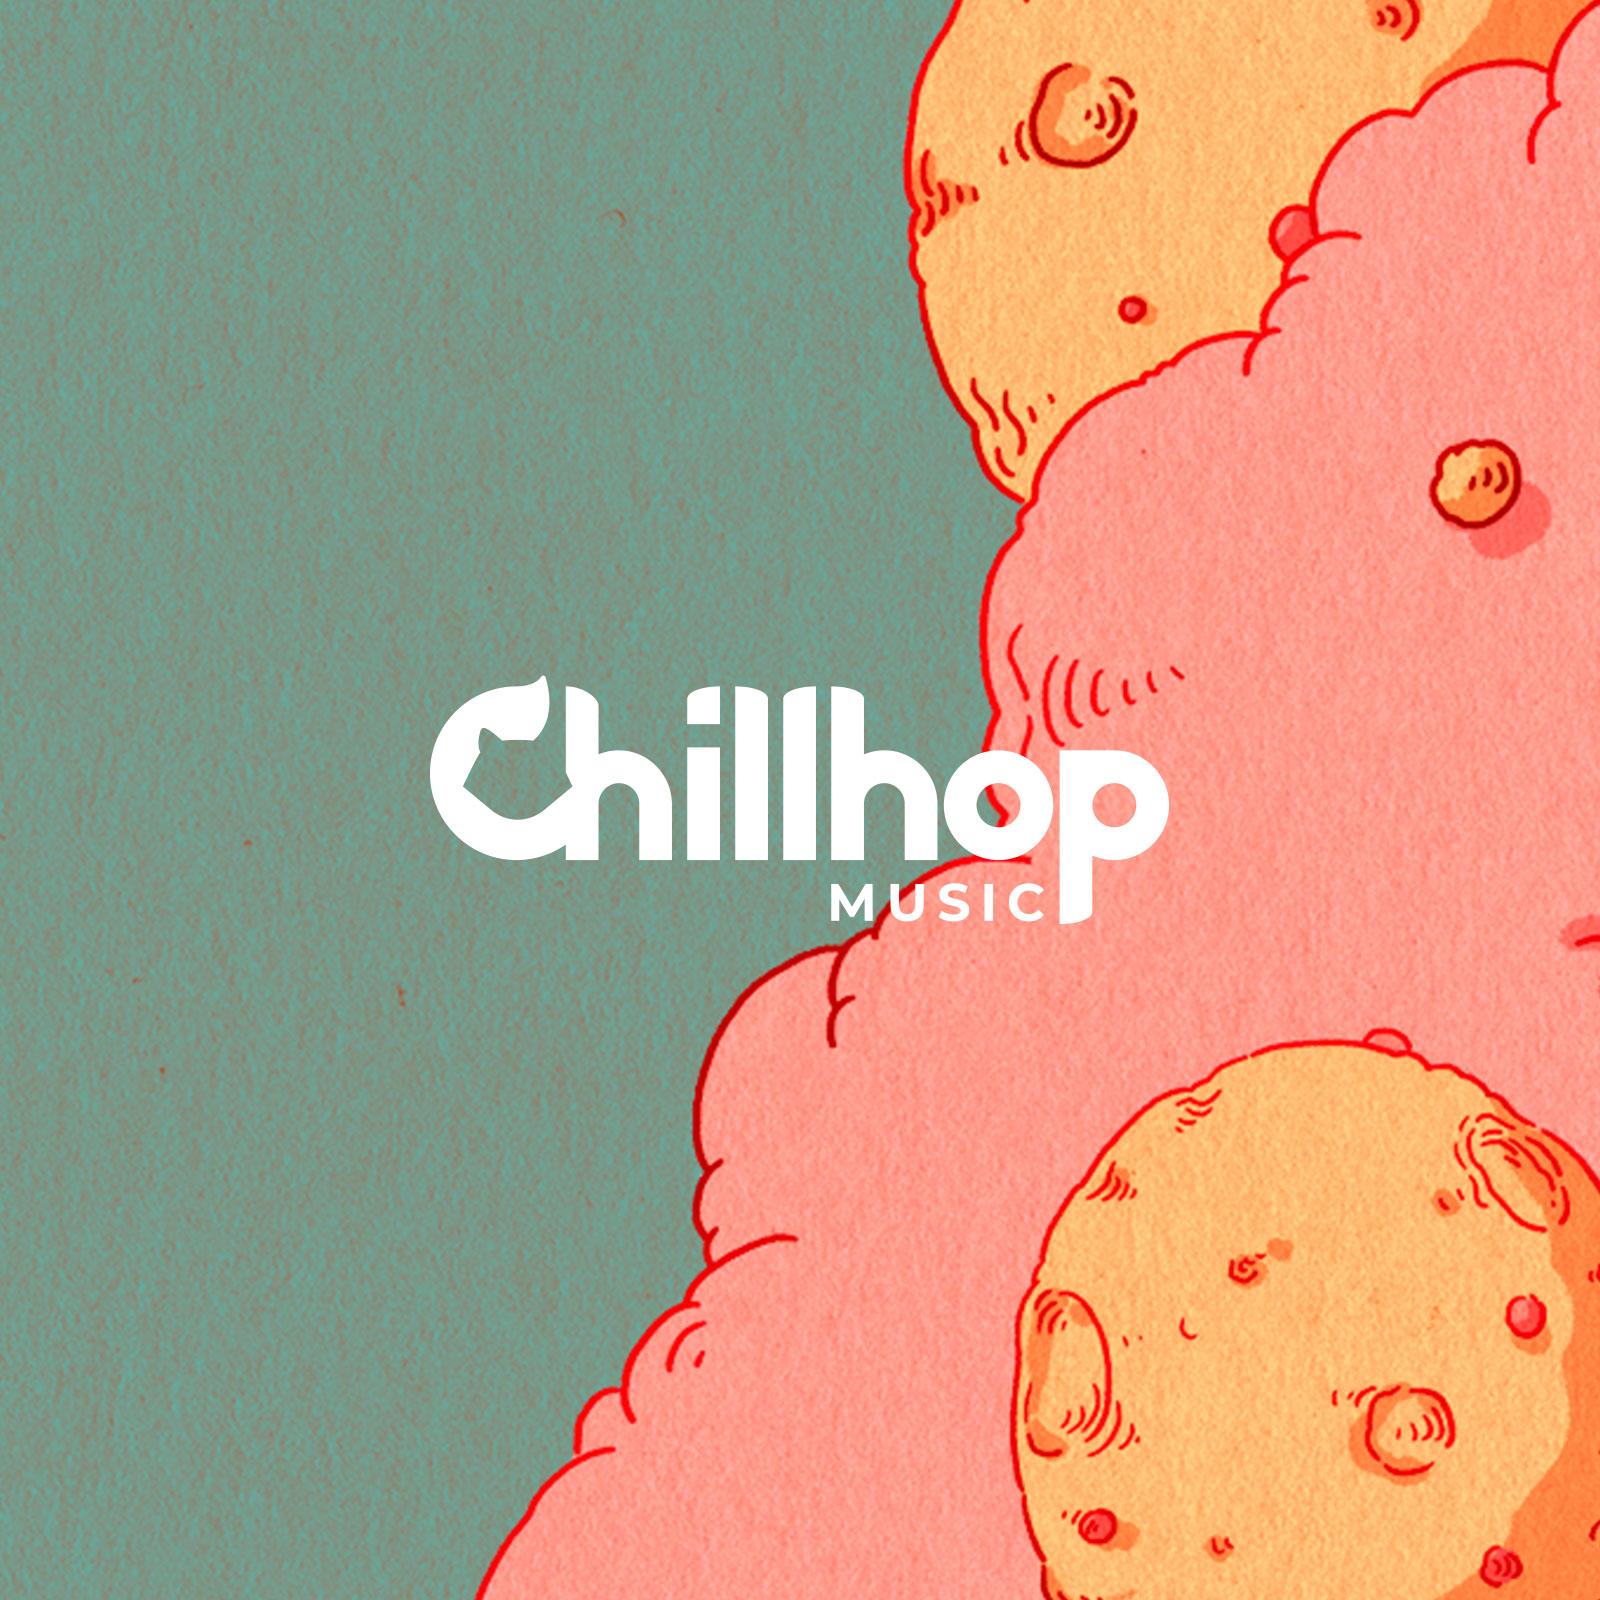 lofi hip hop radio - beats to relax/study to on YouTube